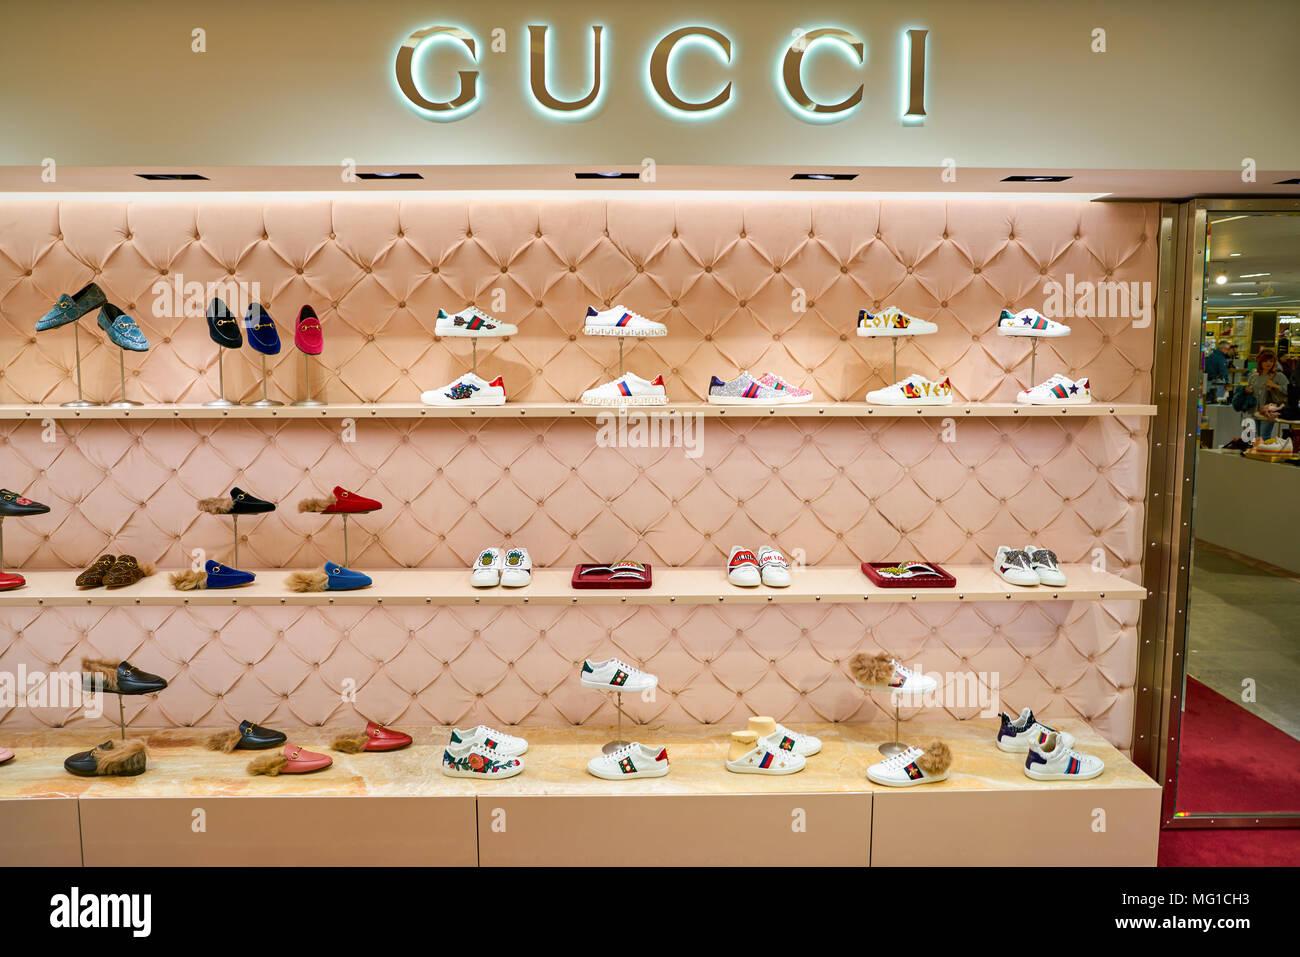 enorme inventario vende uomo MILAN, ITALY - CIRCA NOVEMBER, 2017: Gucci shoes on display ...